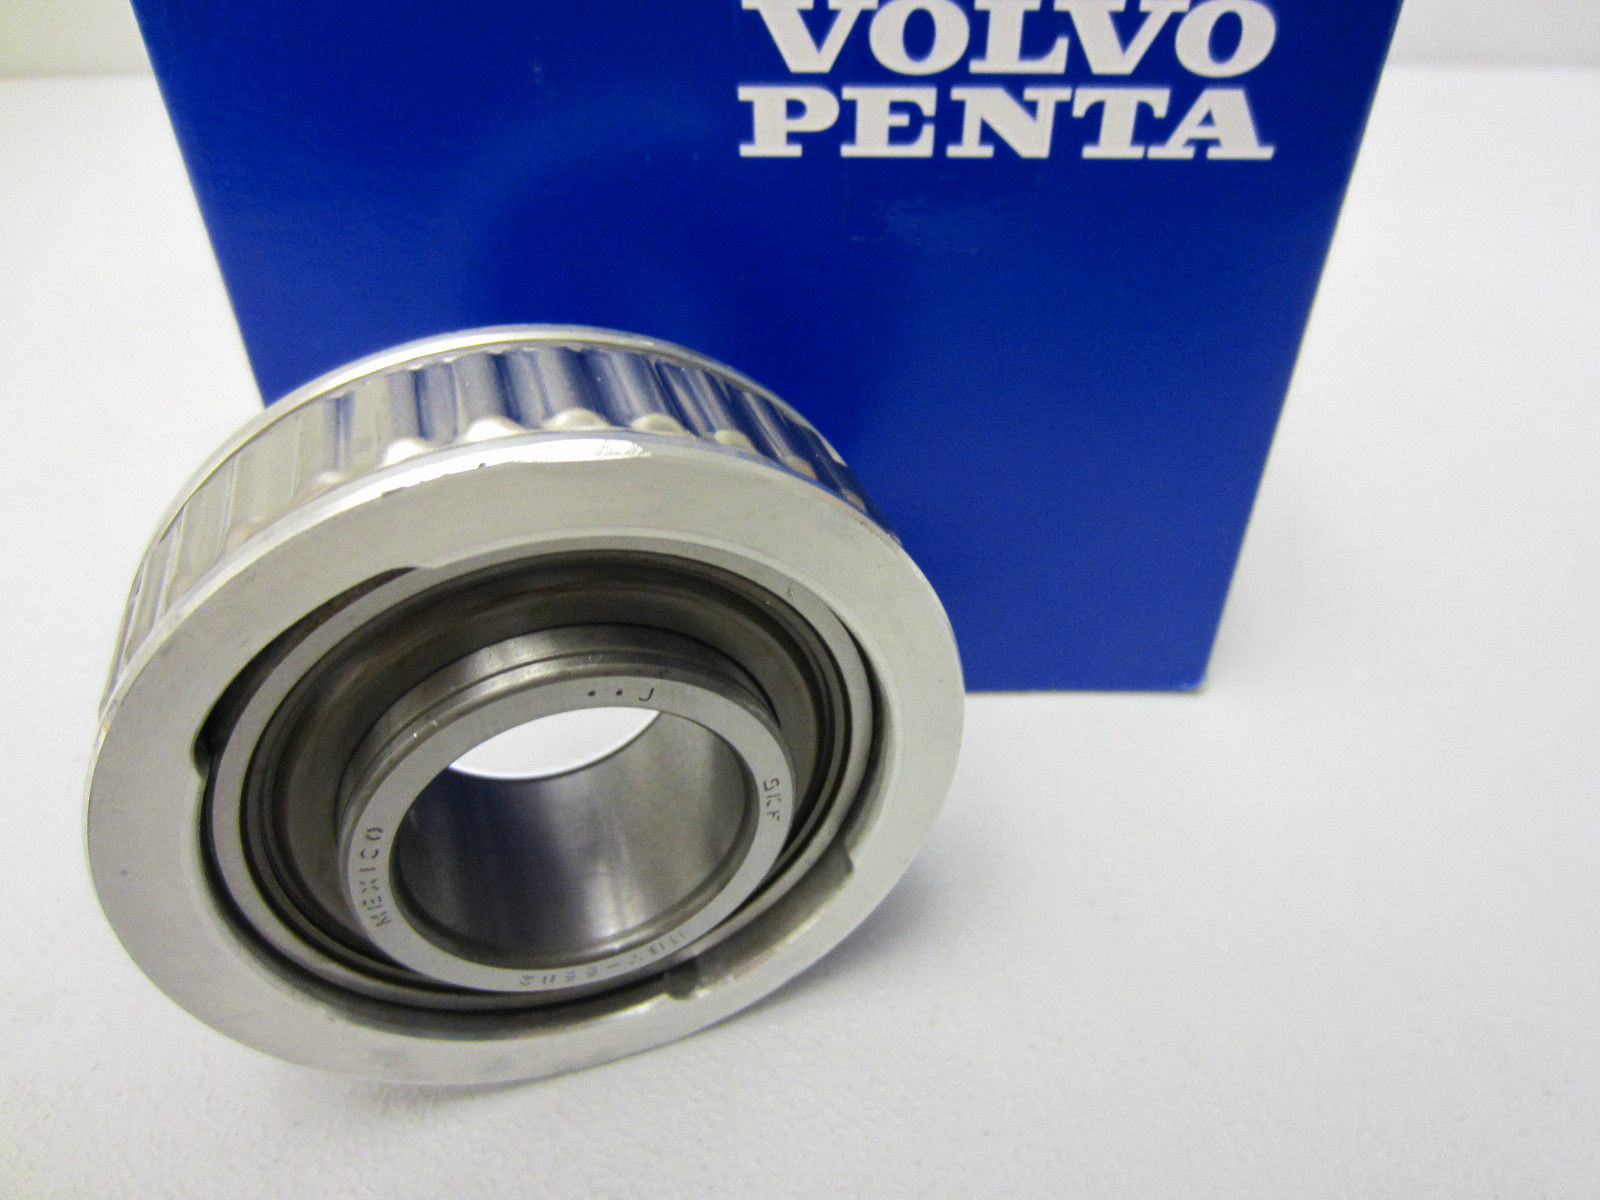 Volvo Penta 21752712 Bearing Volvo Penta 21752712